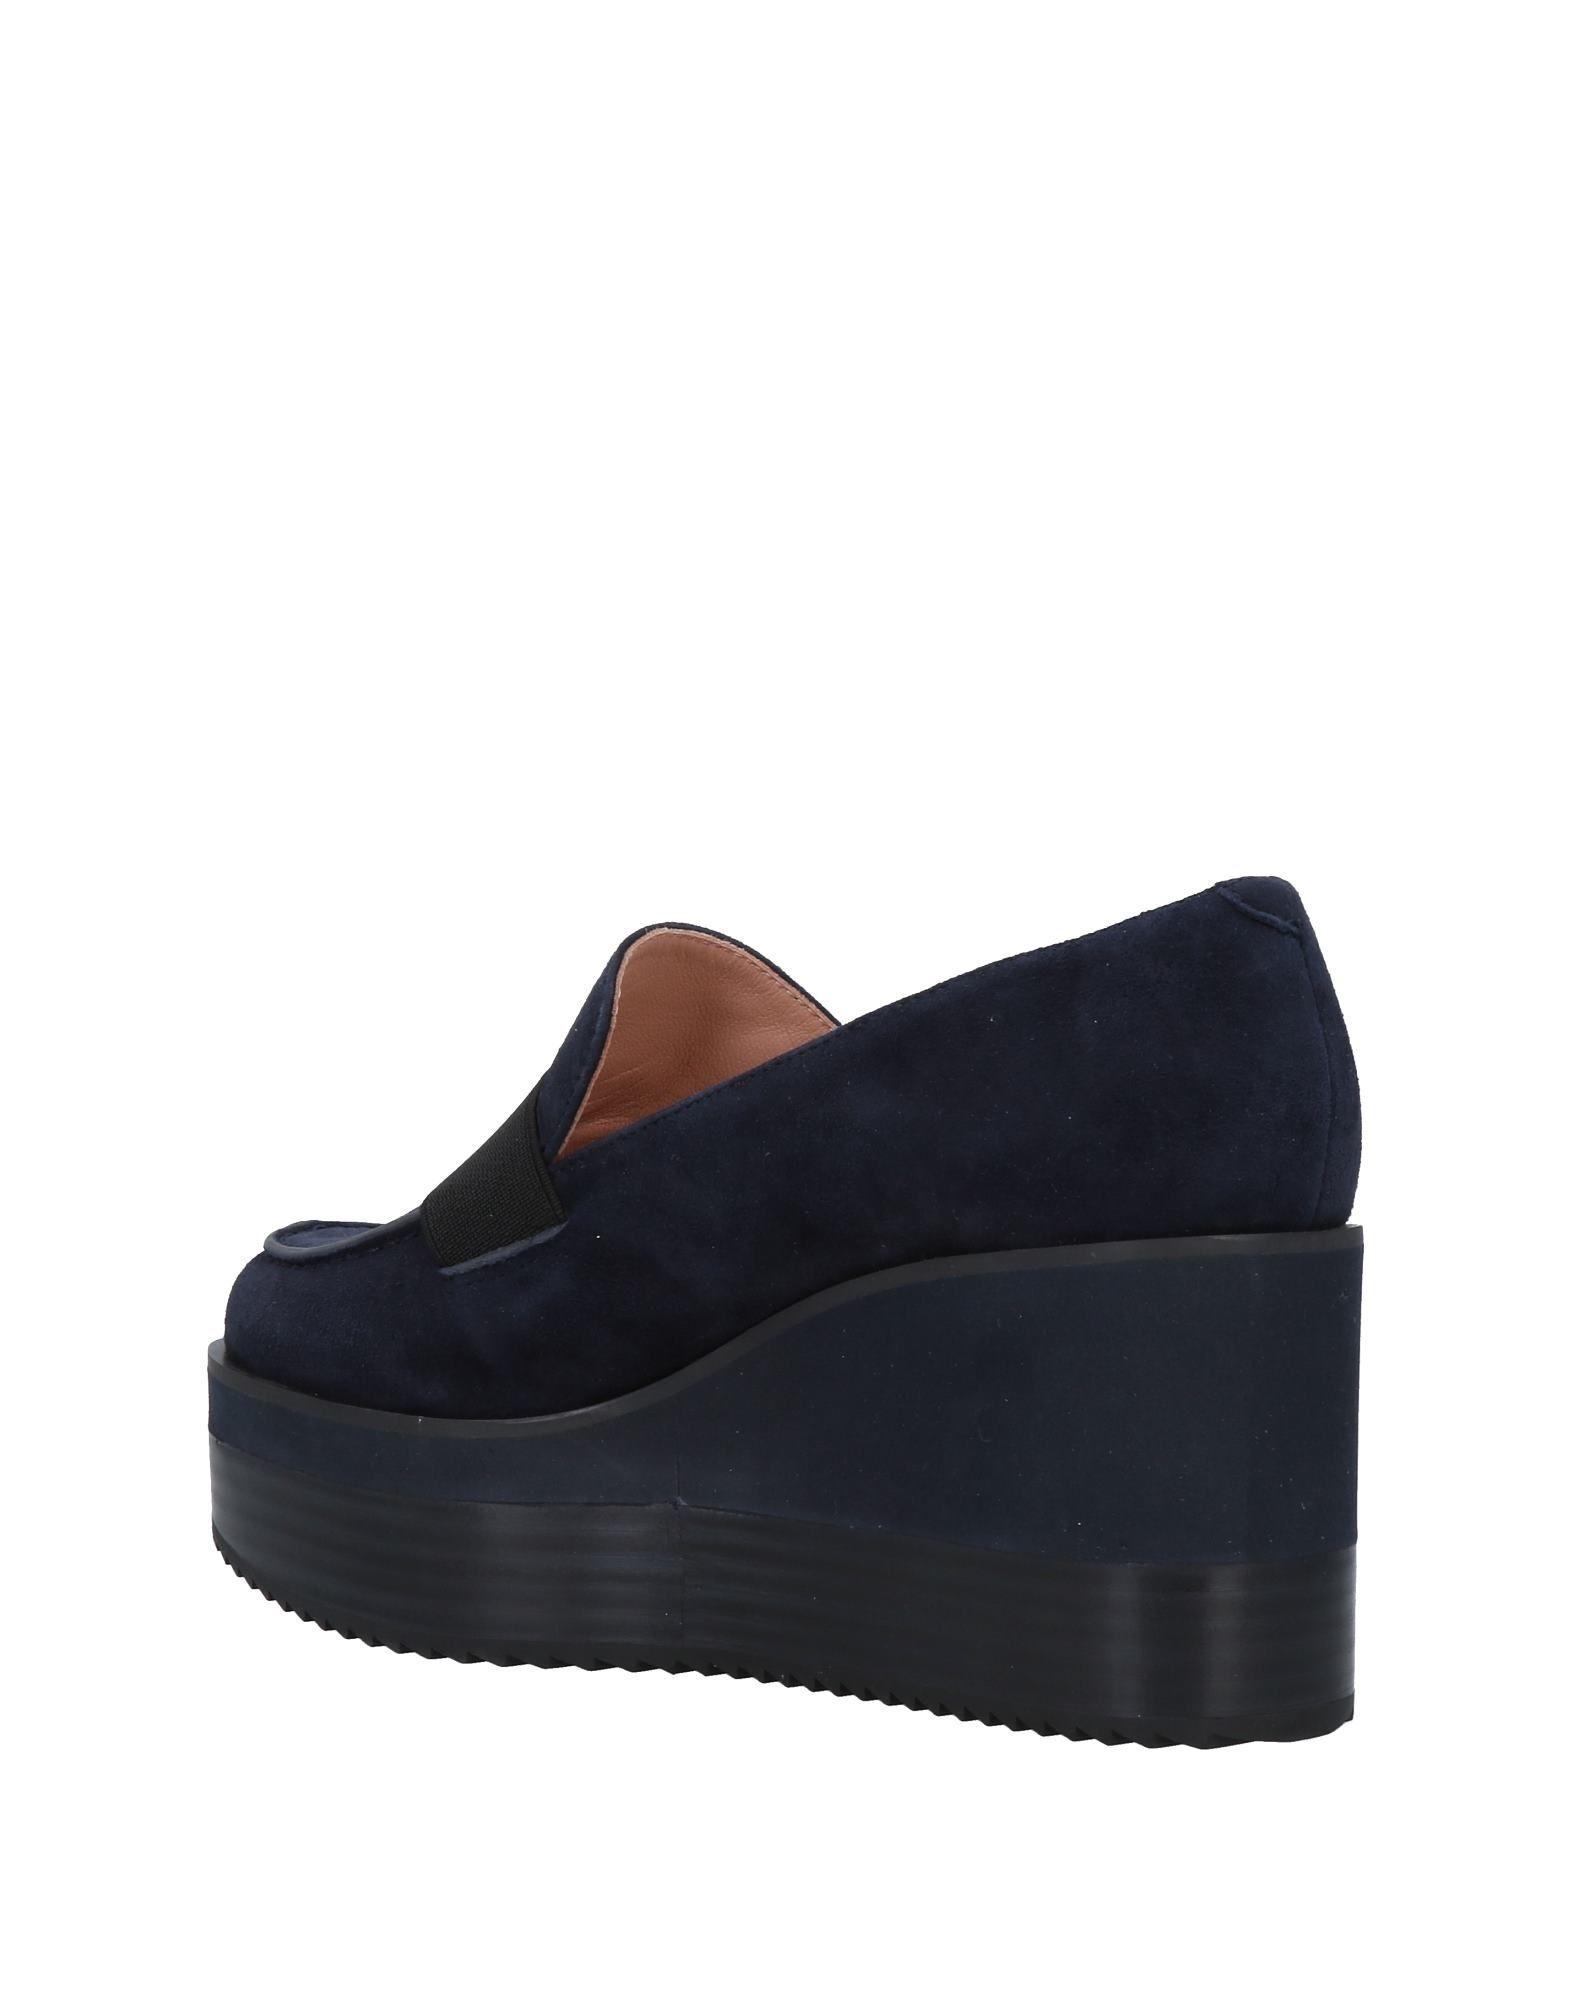 Stilvolle billige Schuhe Jil Sander 11492074OX Navy Mokassins Damen  11492074OX Sander 91962d